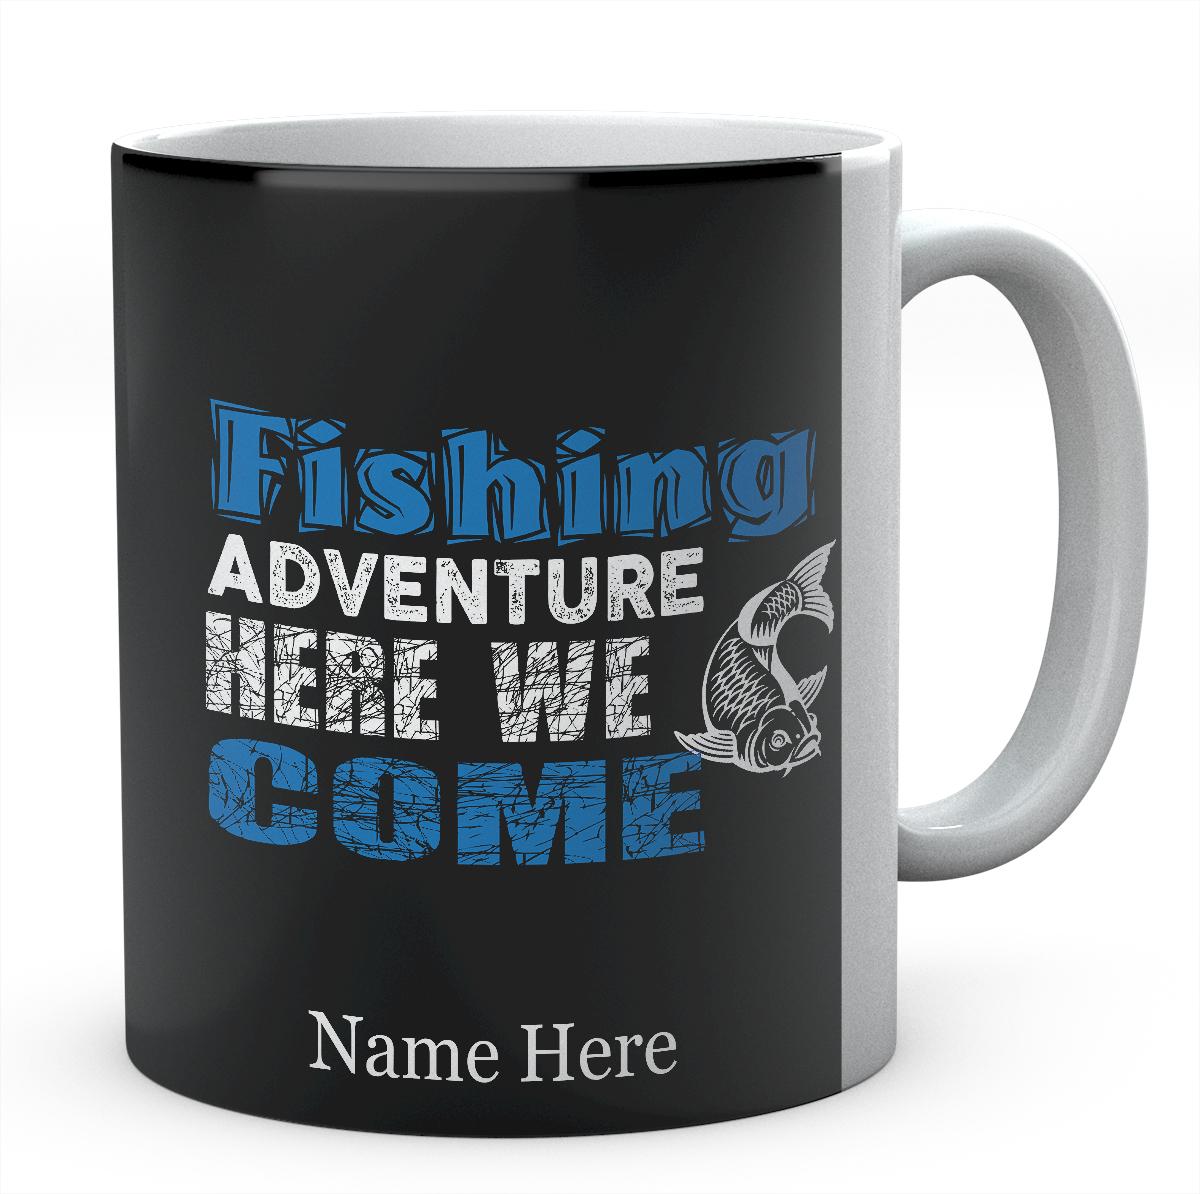 Personalised Fishing Adventure Here We Come Mug